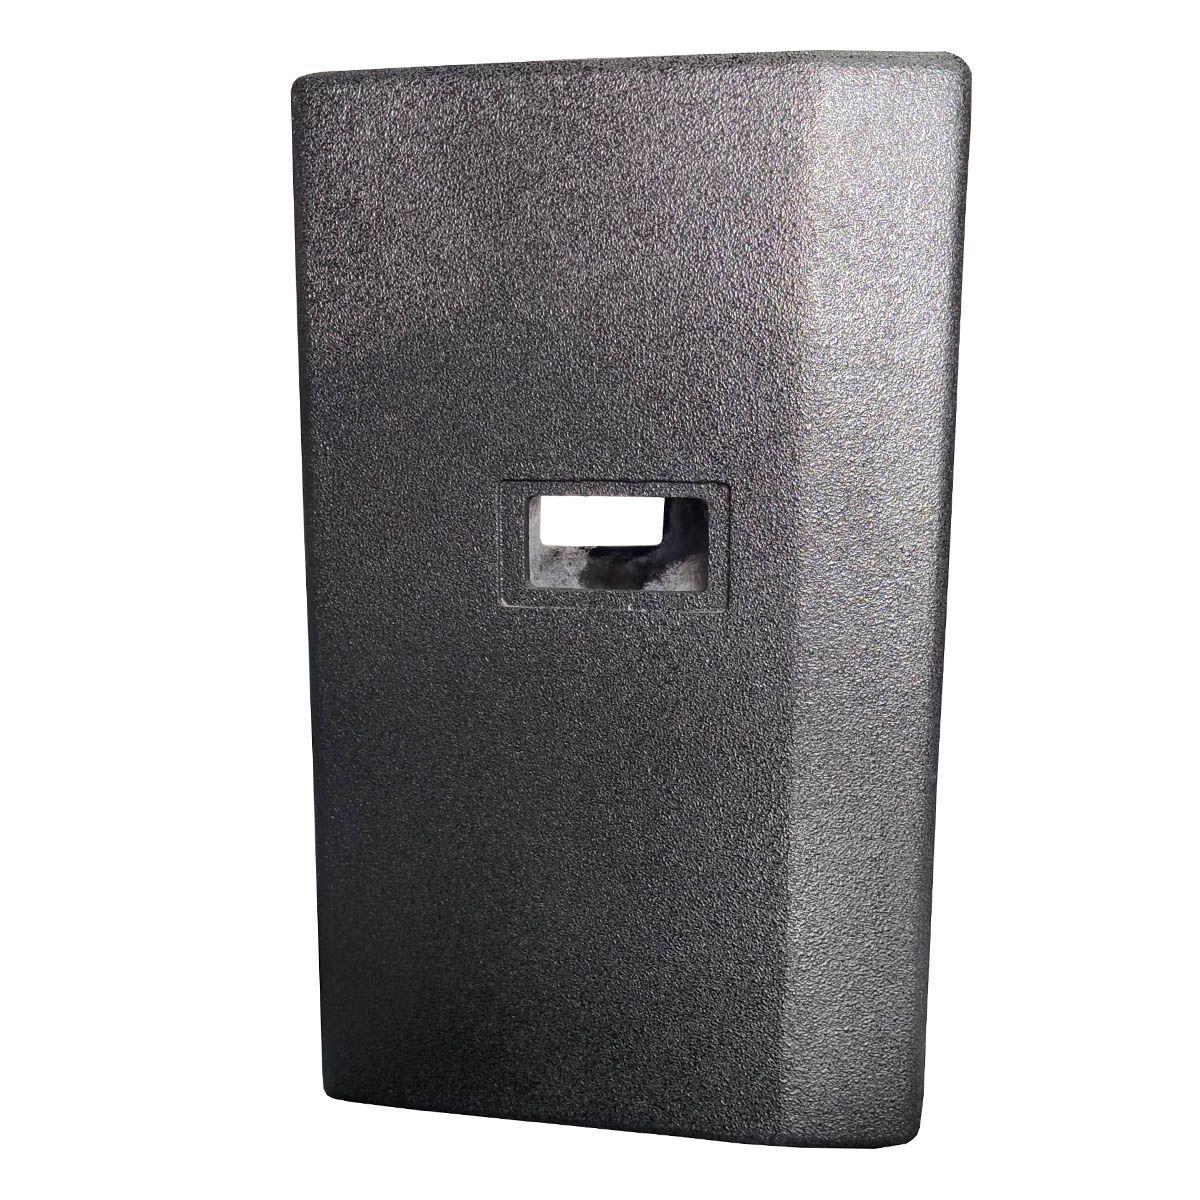 Gabinete Caixa Acústica TP 12 - Leacs (Gabinete Vazio)  - RS Som e Luz!